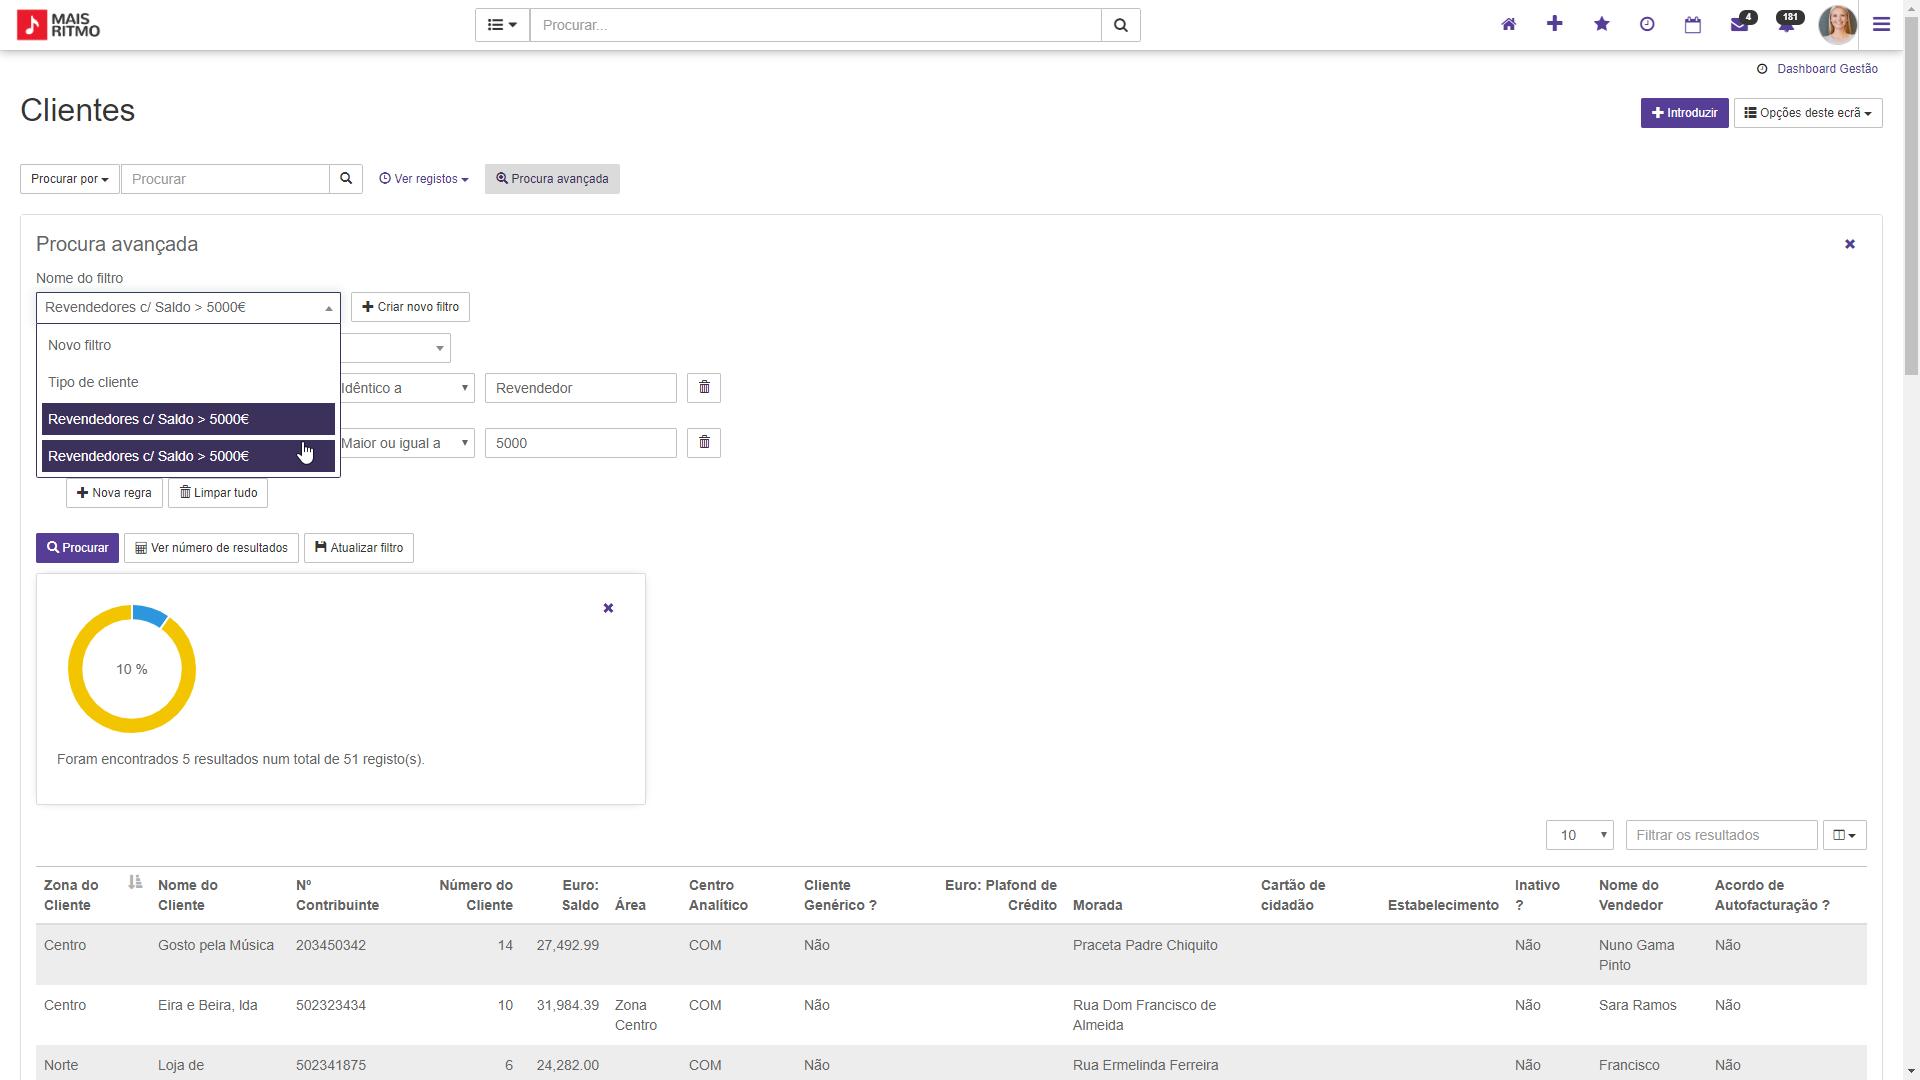 IDIR190828_ UX_UI_filtros_procura_avancada_web_2